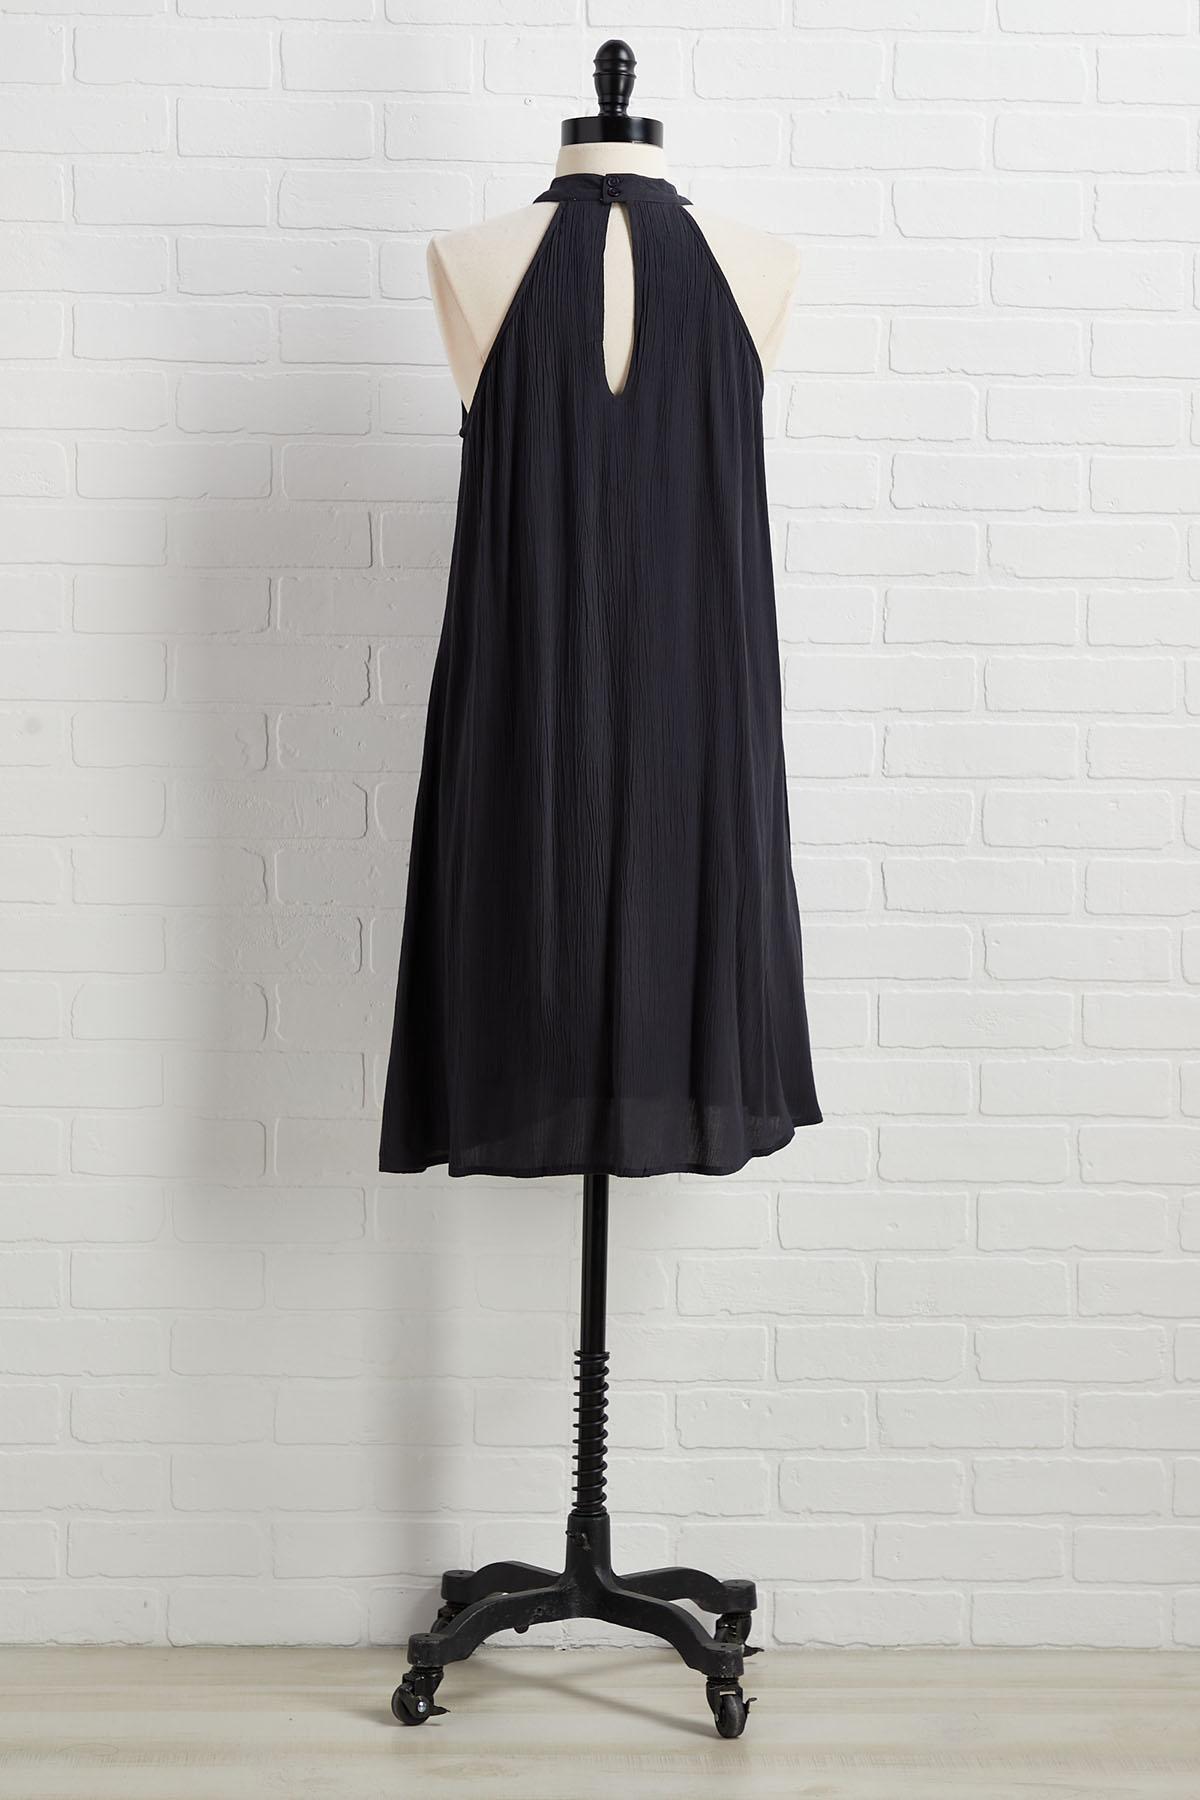 Ticket To Tulum Dress